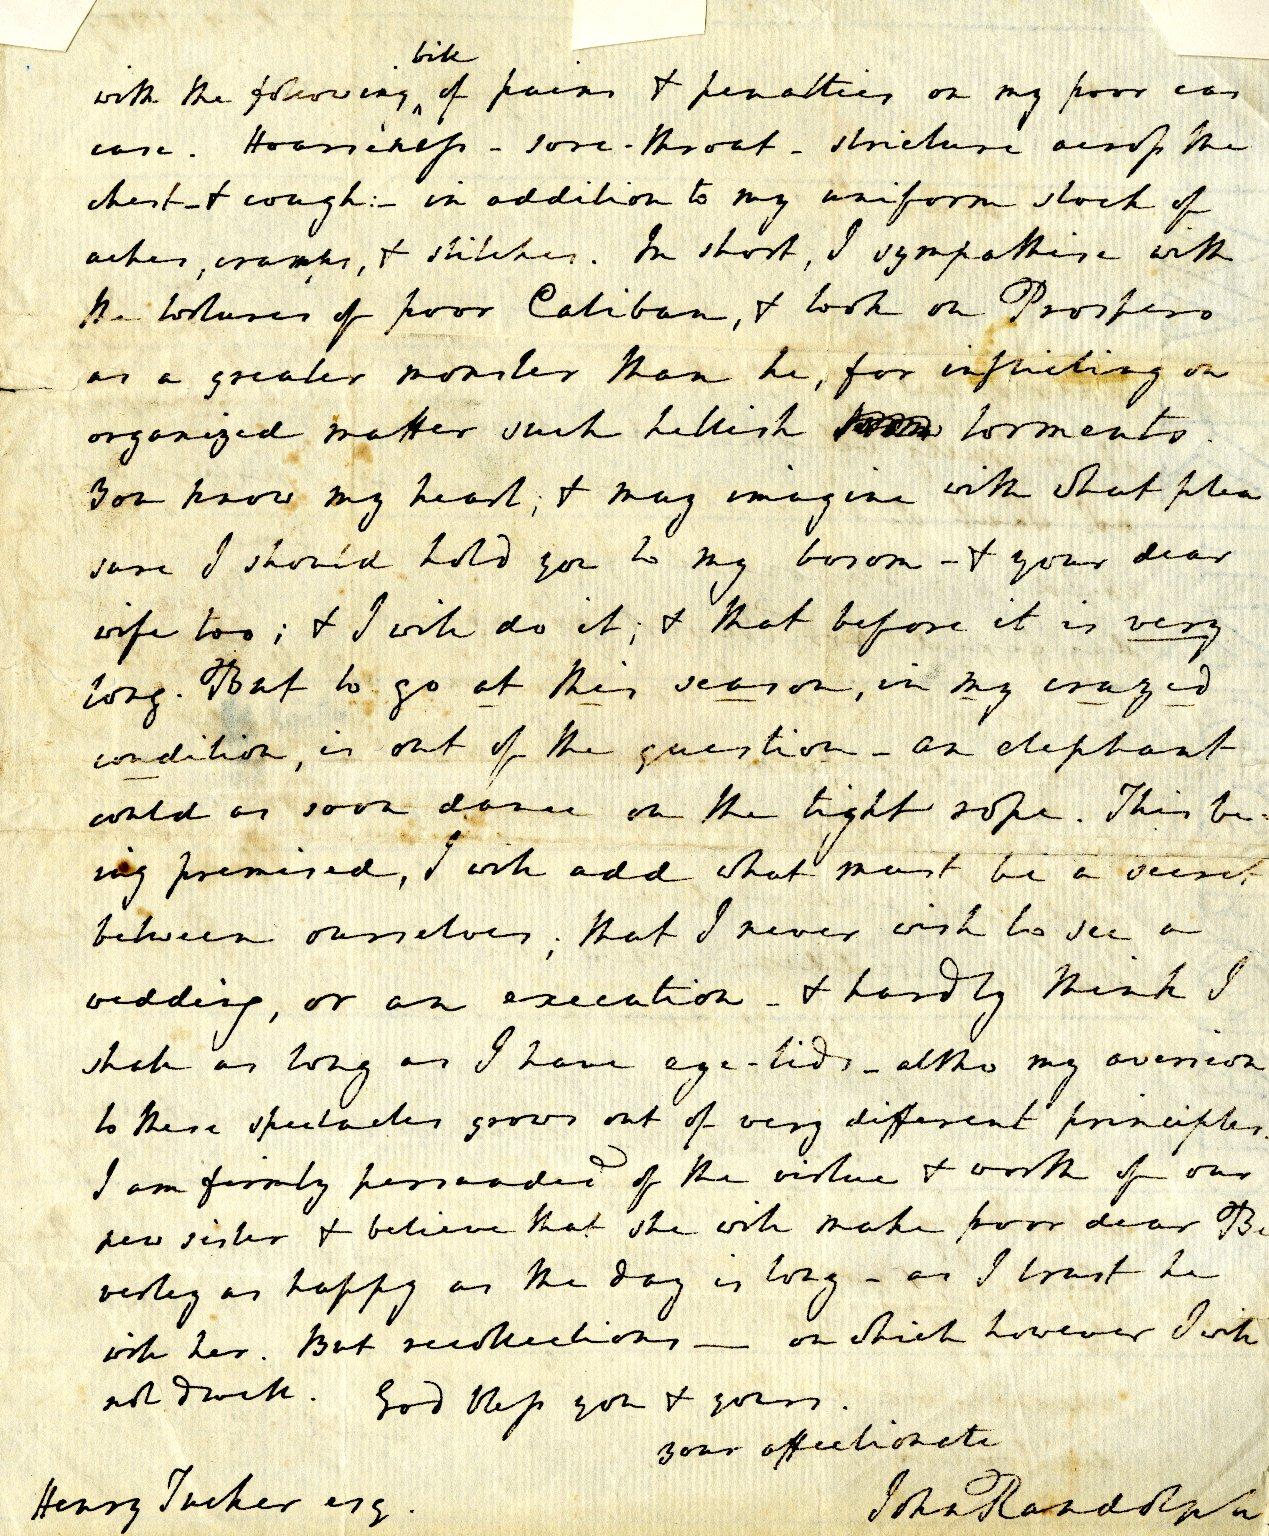 Randolph, John to Henry Tucker. ALS, 2 pages, February 3, 1809.